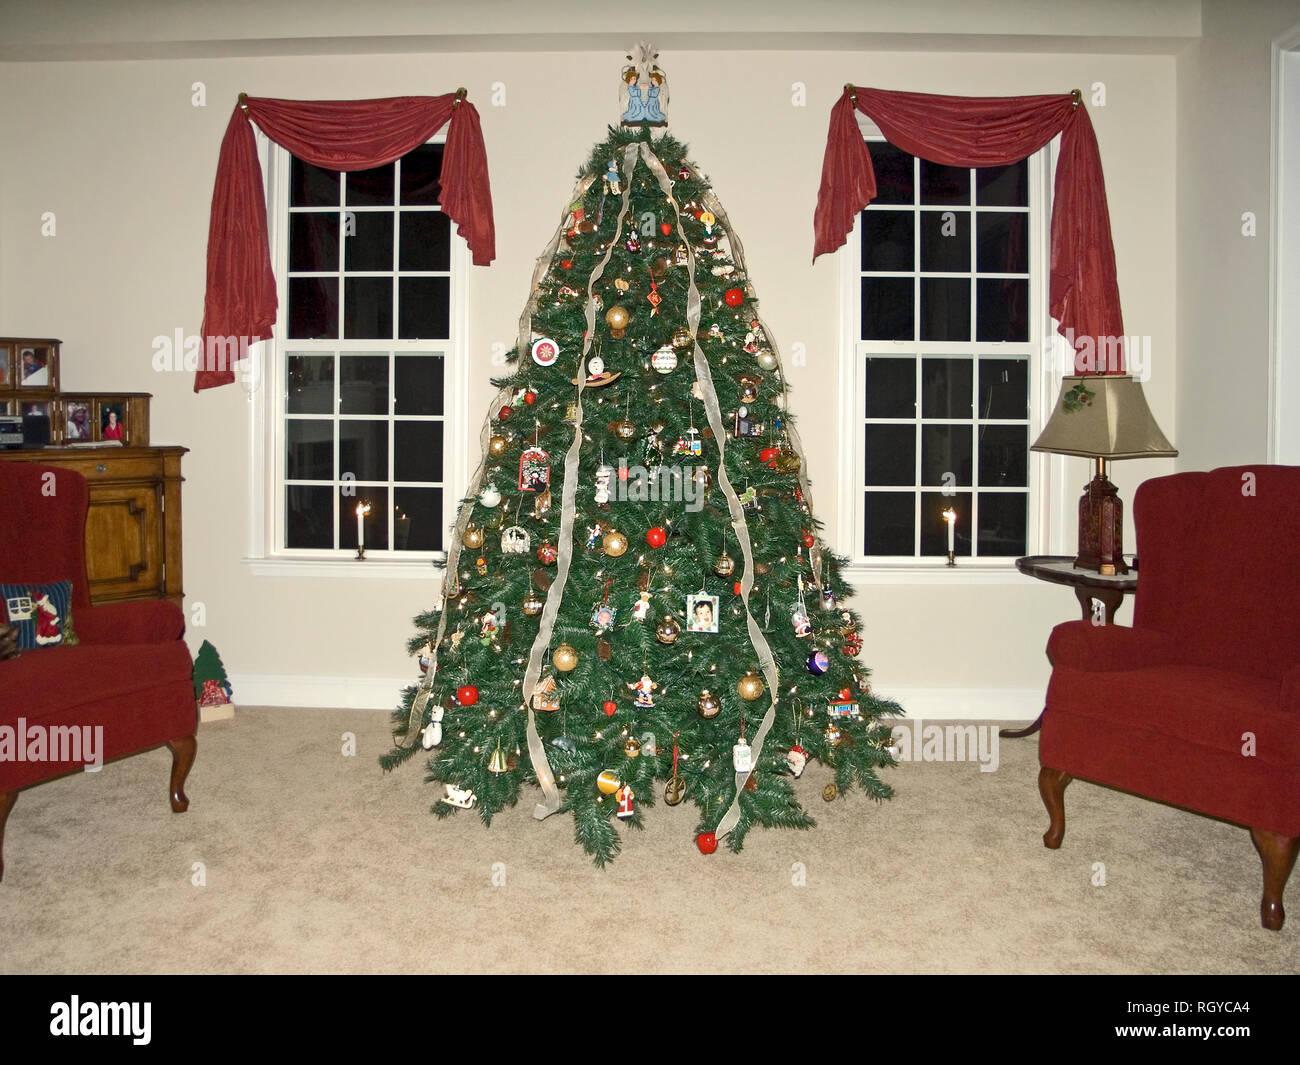 Fotos Casas Decoradas Navidad.Arbol De Navidad Decoradas Luces 2 Windows